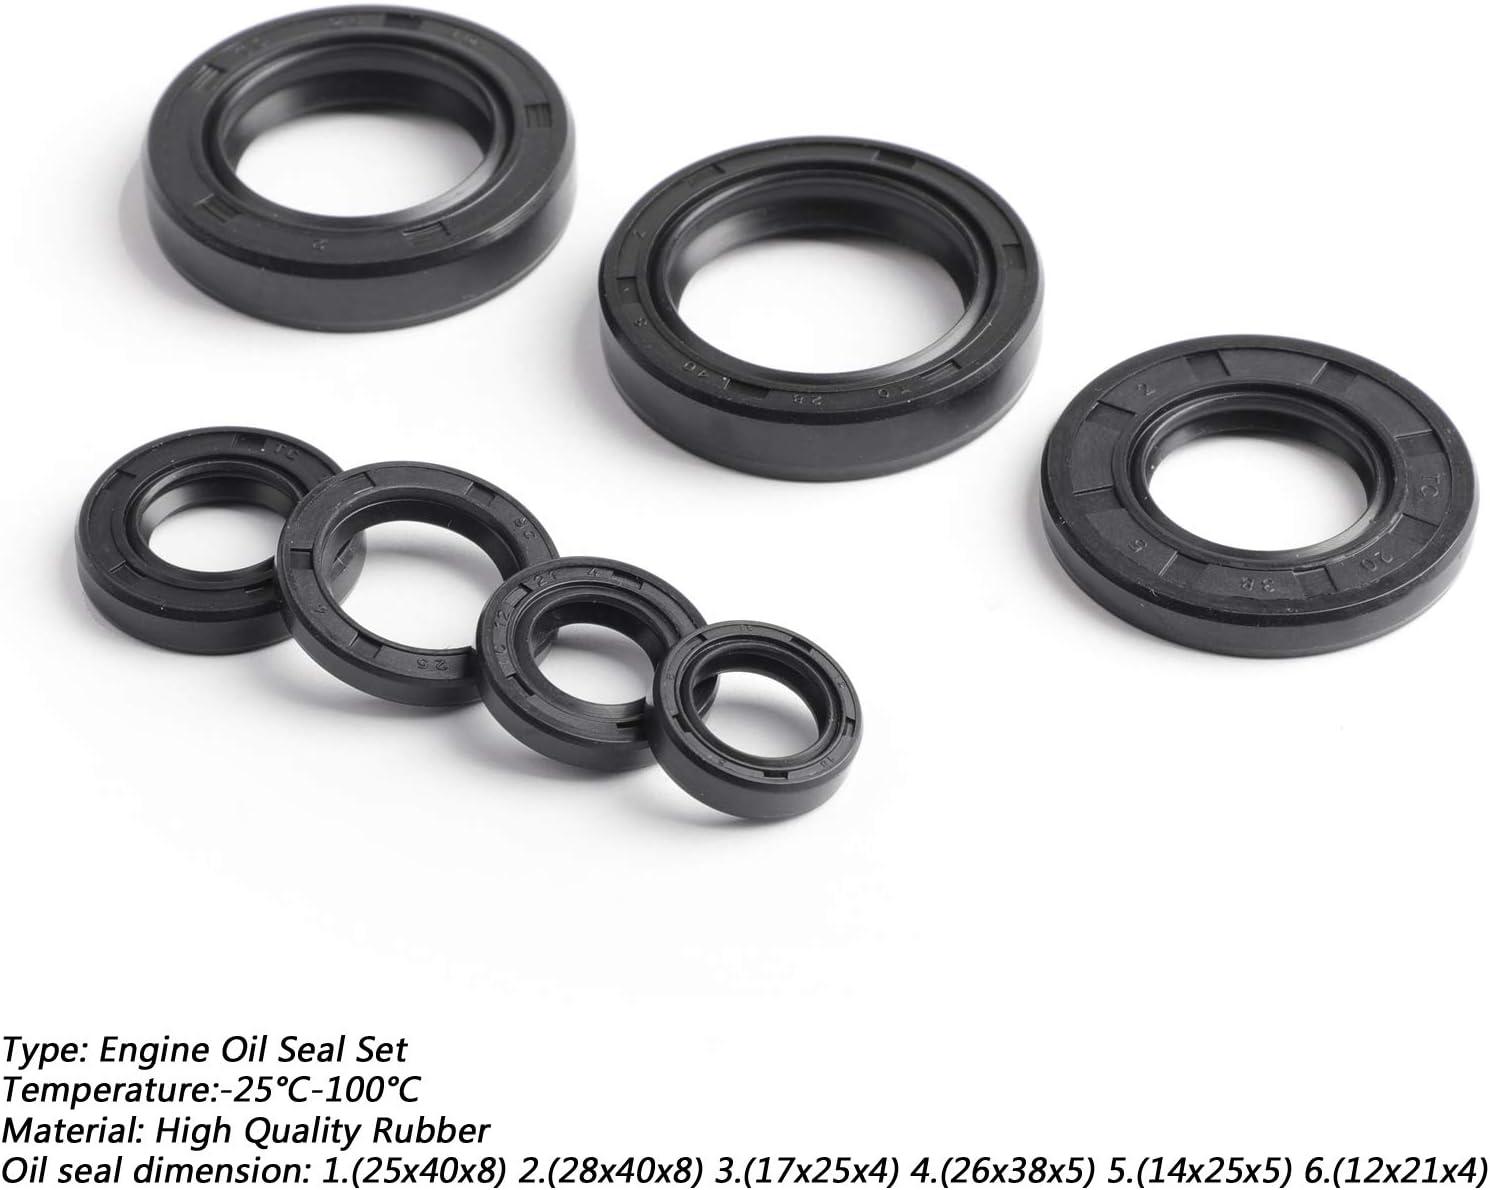 CHENDGE2 Engine Oil Seal Kits for Yama-ha DT175 MX175 74-81 DT125 YZ125 77-80 MX125 1976